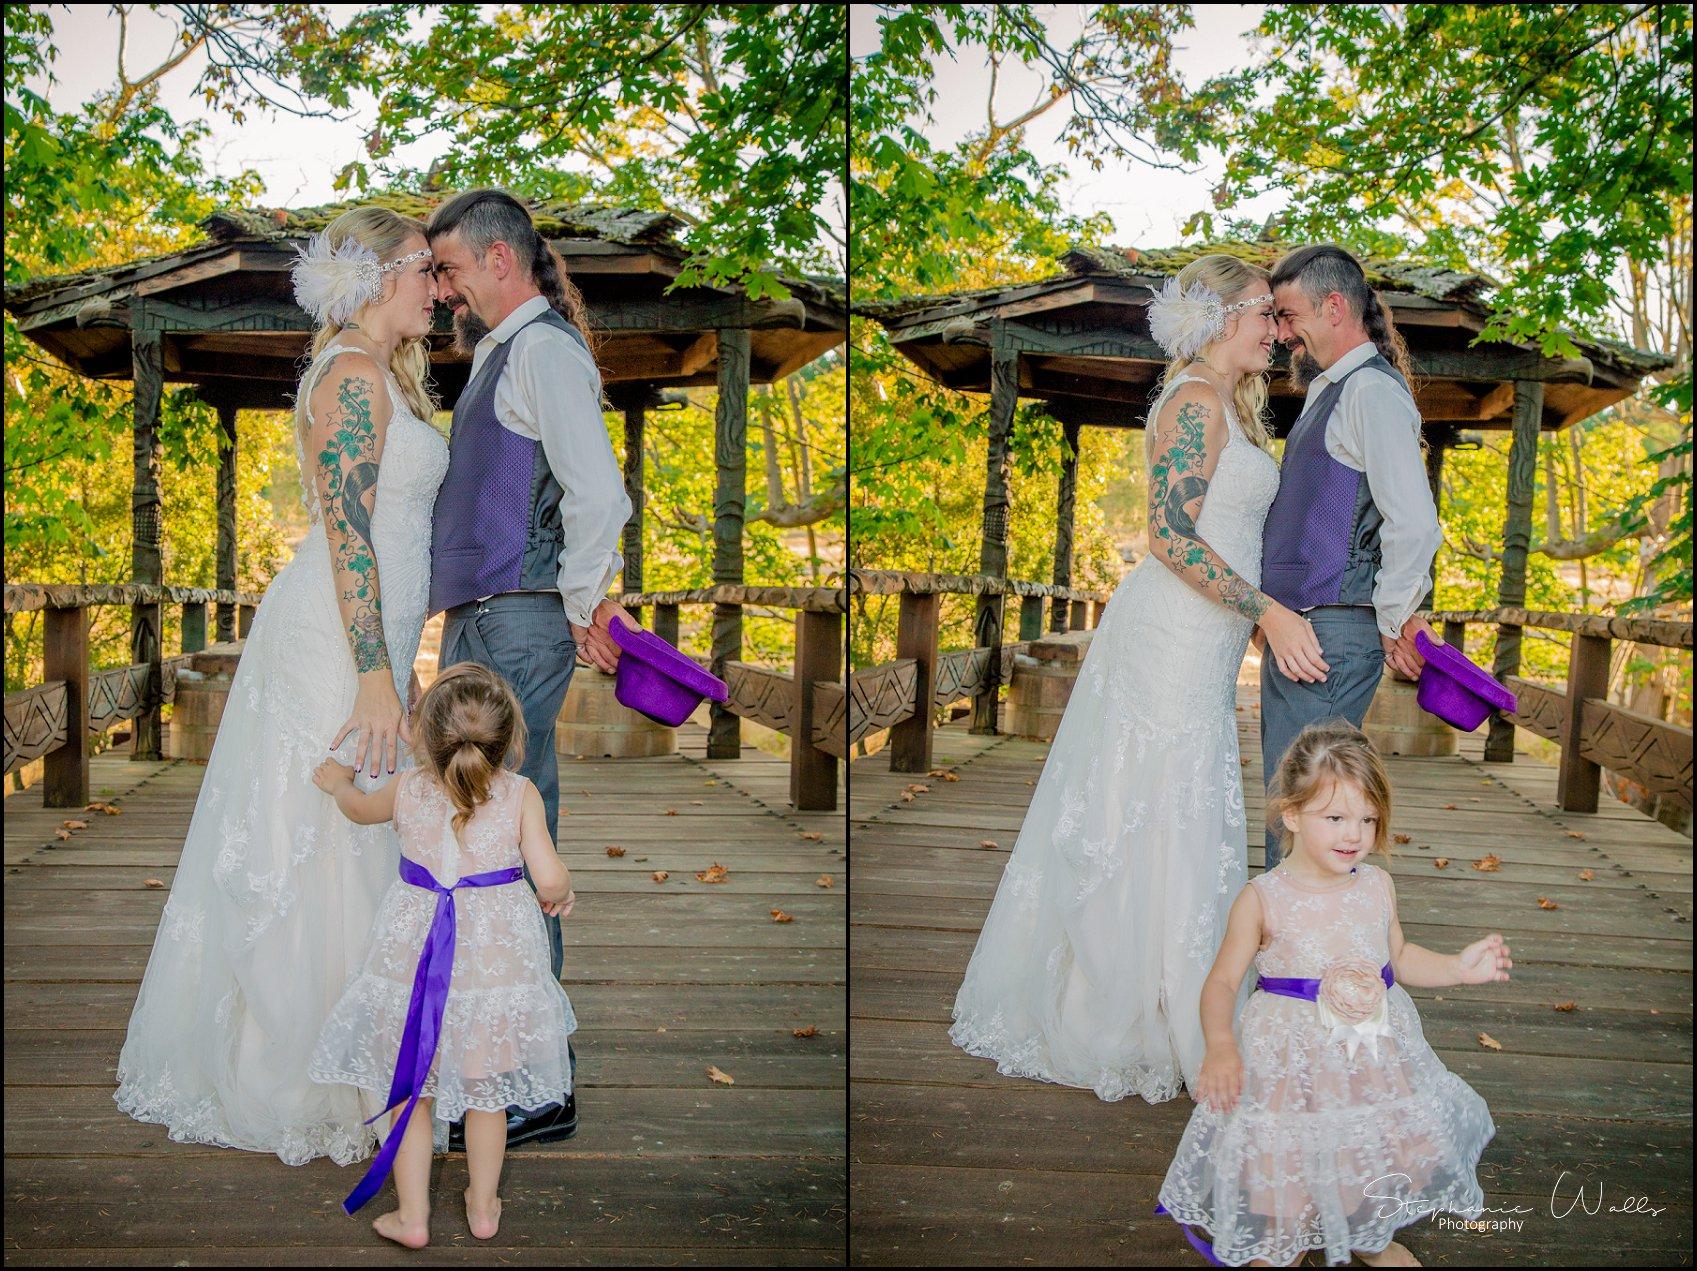 Everist Wedding 044 Patti & Bobbys | Troll Haven Castle & Bandy Farms | Sequim, Wa Wedding Photographer